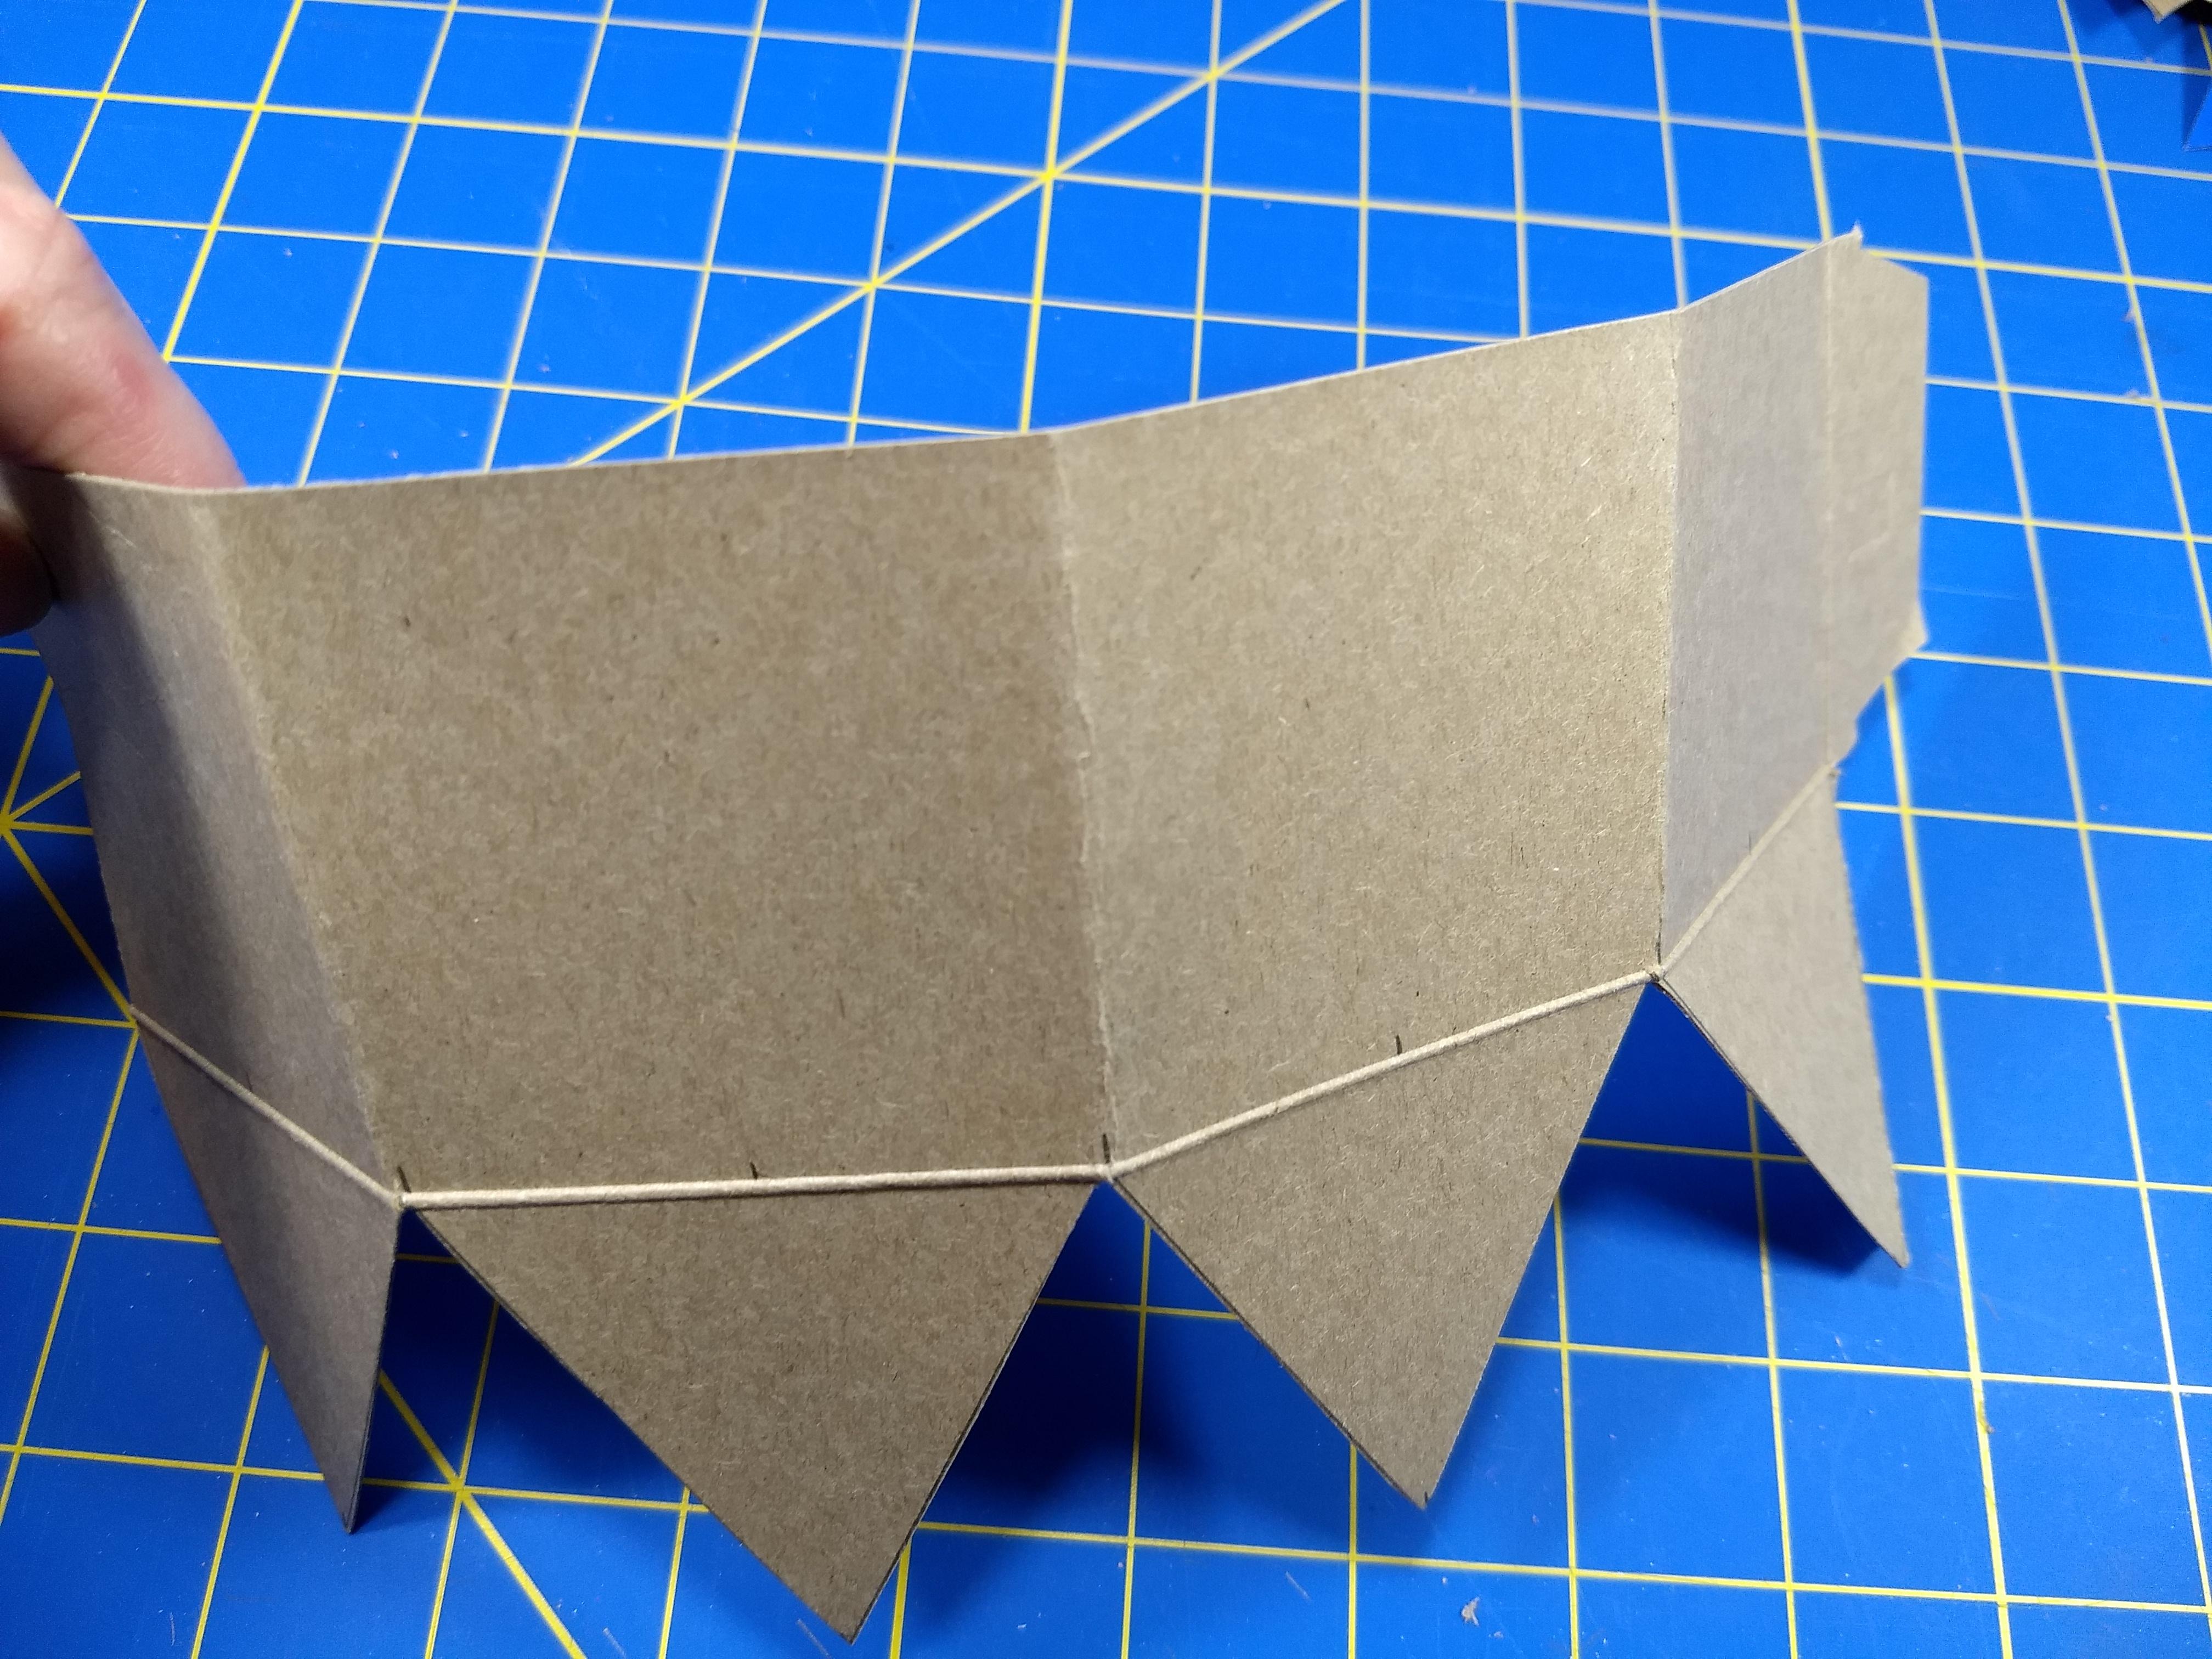 gaming_3-Fold.jpg